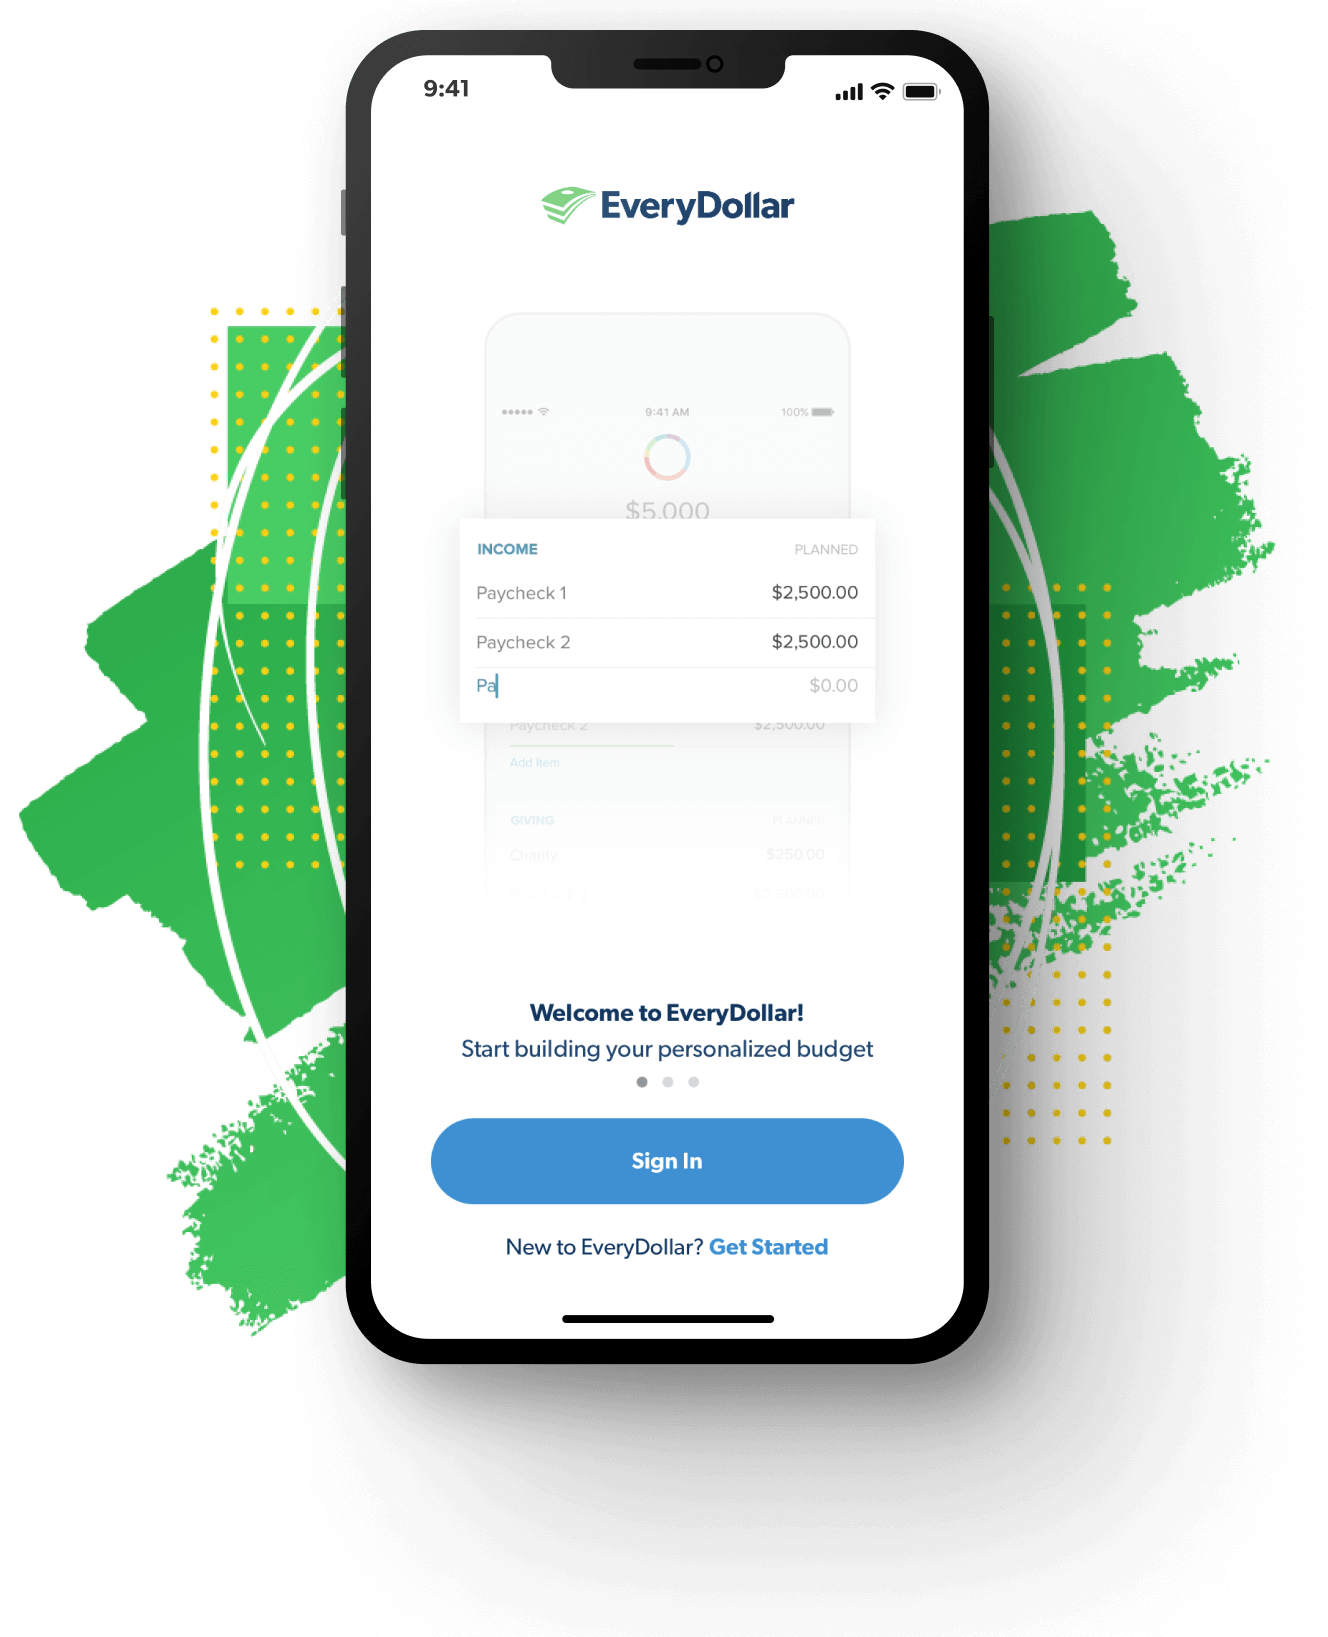 EveryDollar app onboarding screen